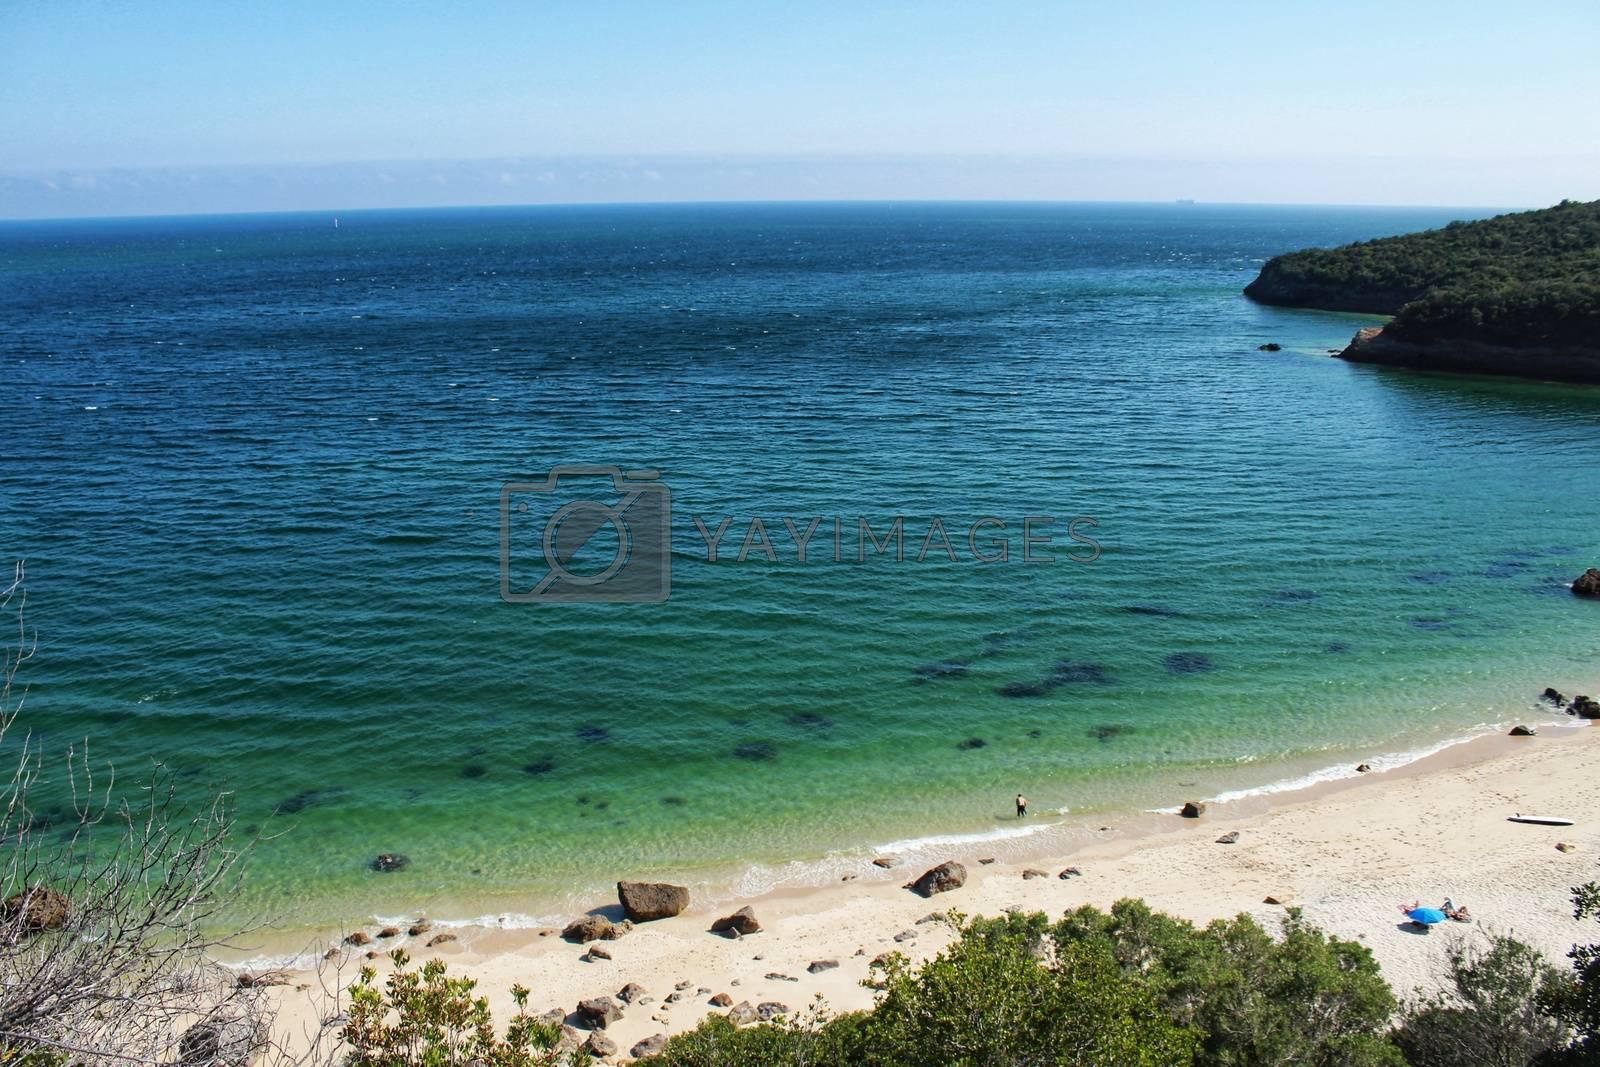 Crystalline waters of Galapinhos Beach between mountains in Portugal